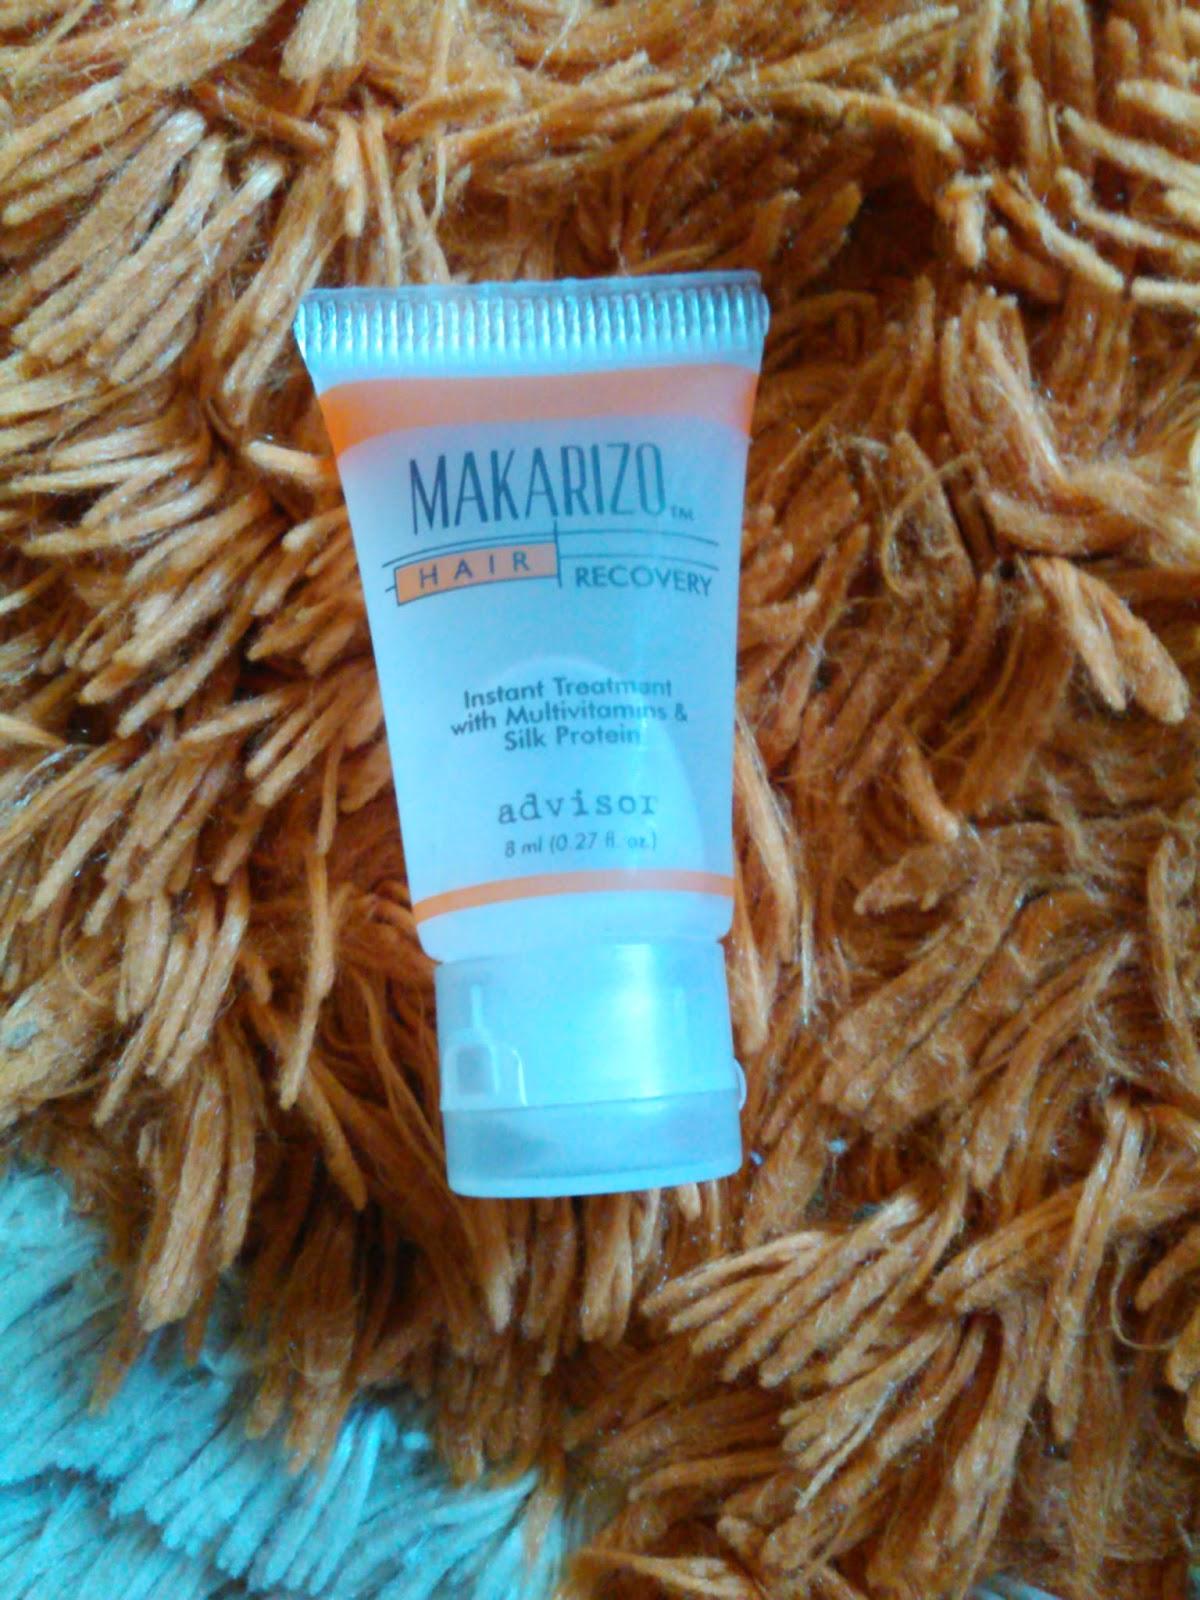 Makarizo Hair Recovery Ini